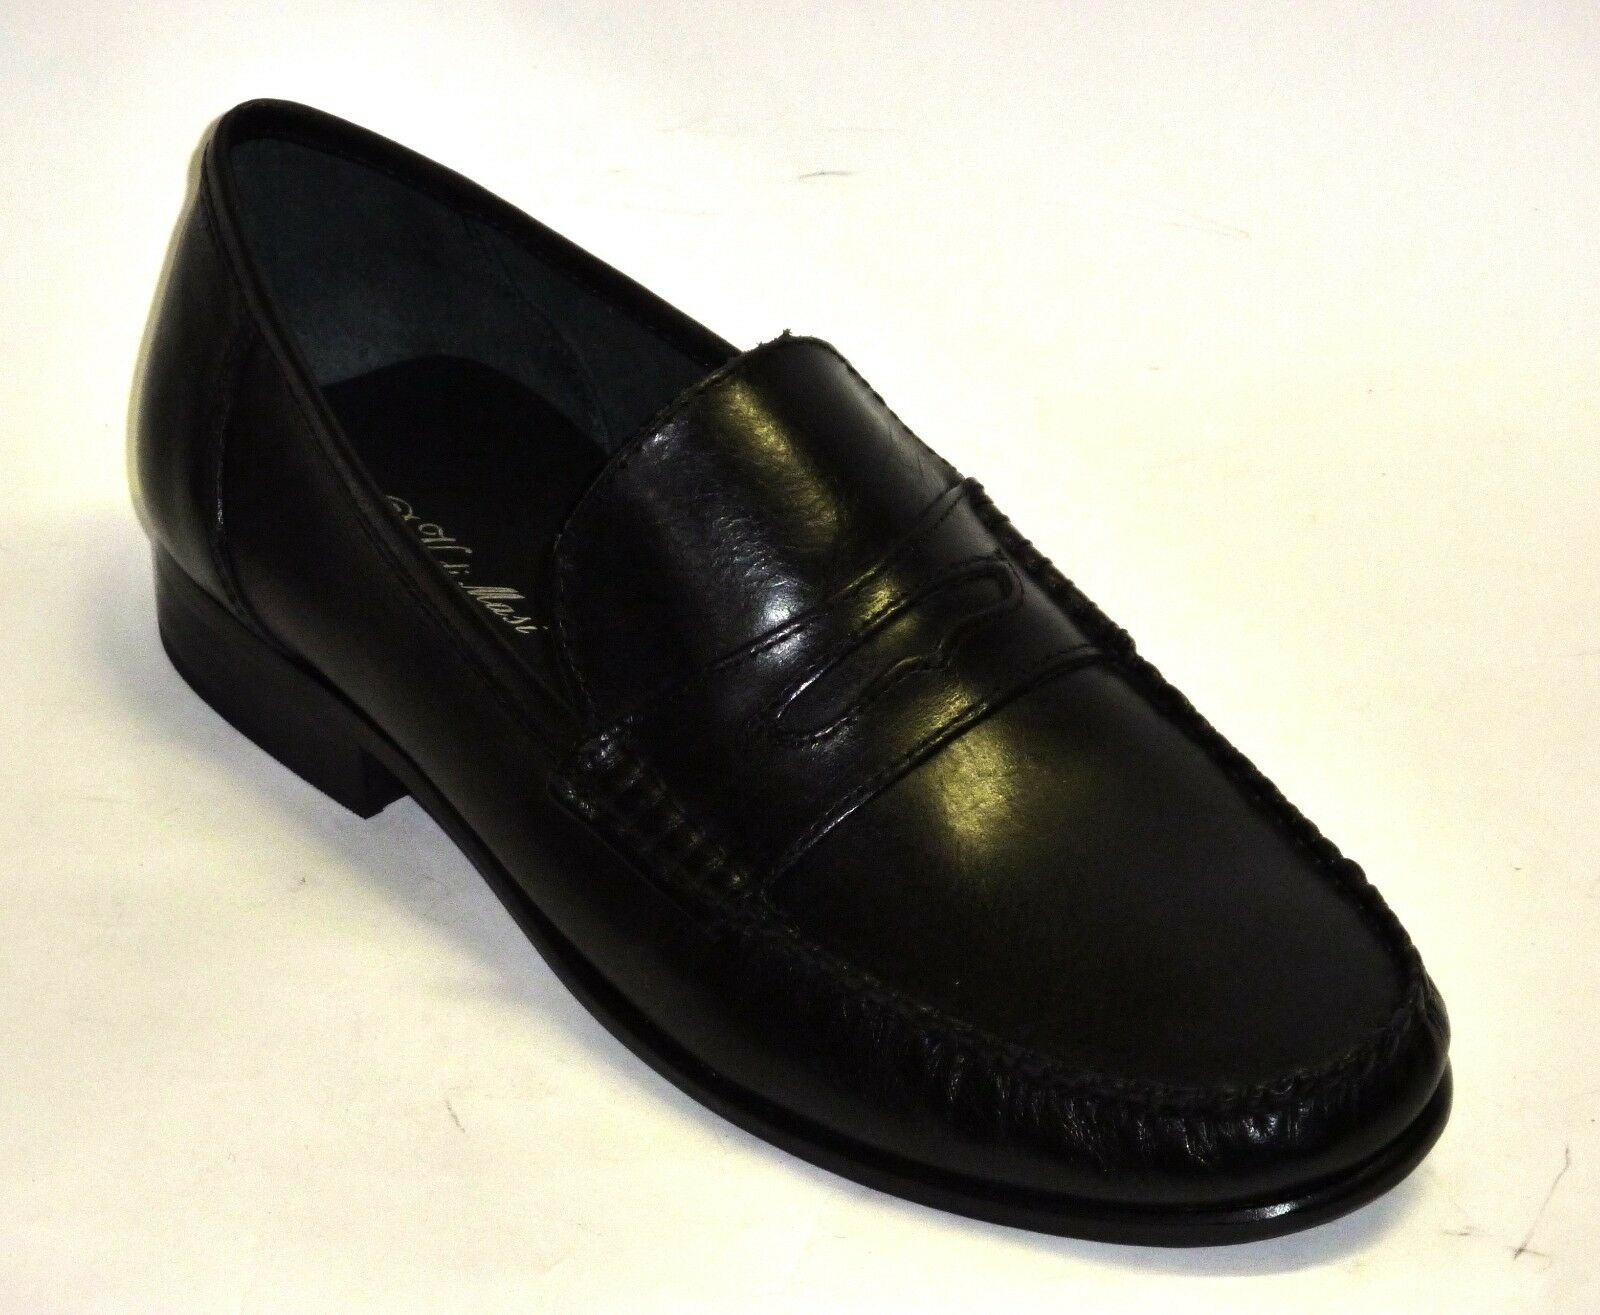 Mokassin Schuhe elegante Männerschuhe schwarzes Leder n.45